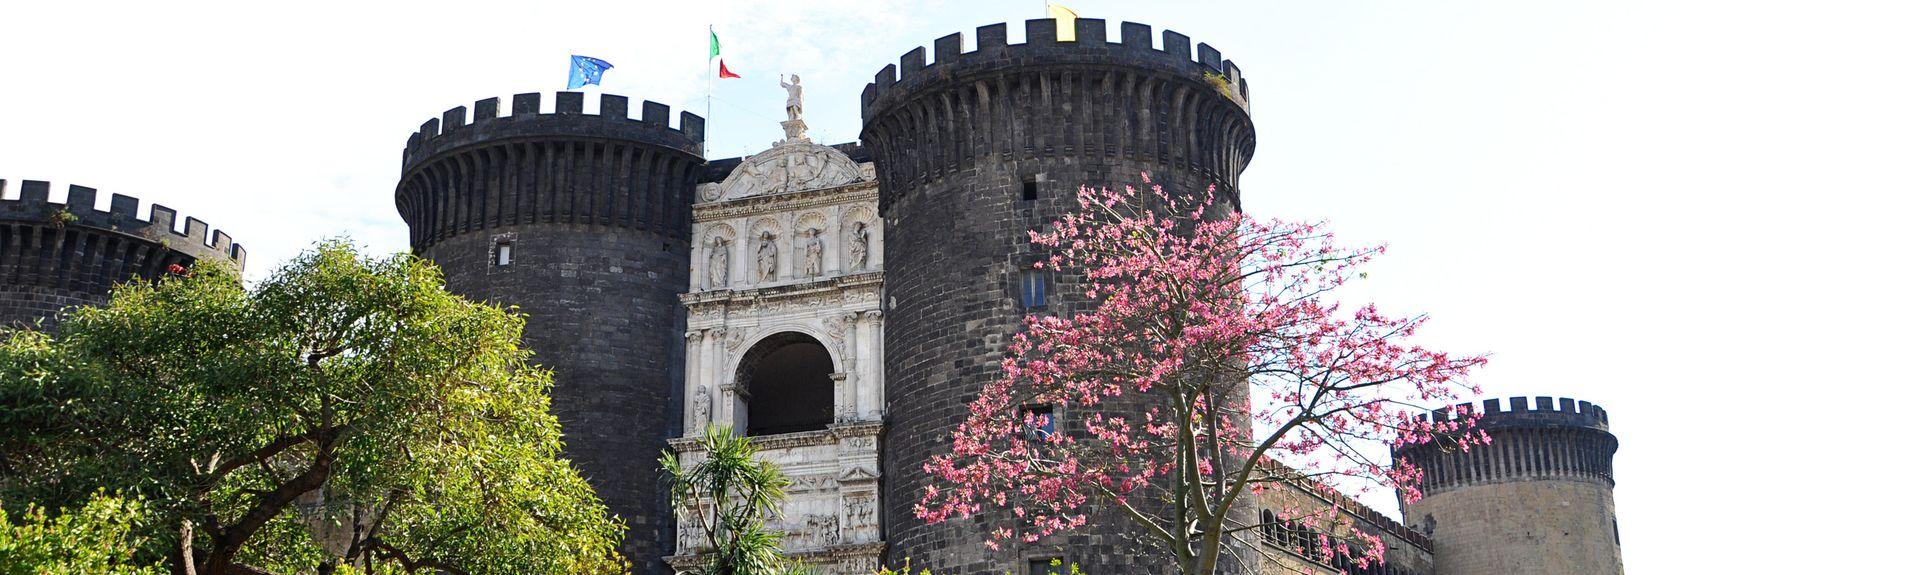 Vasto, Napoli, Campania, Italia